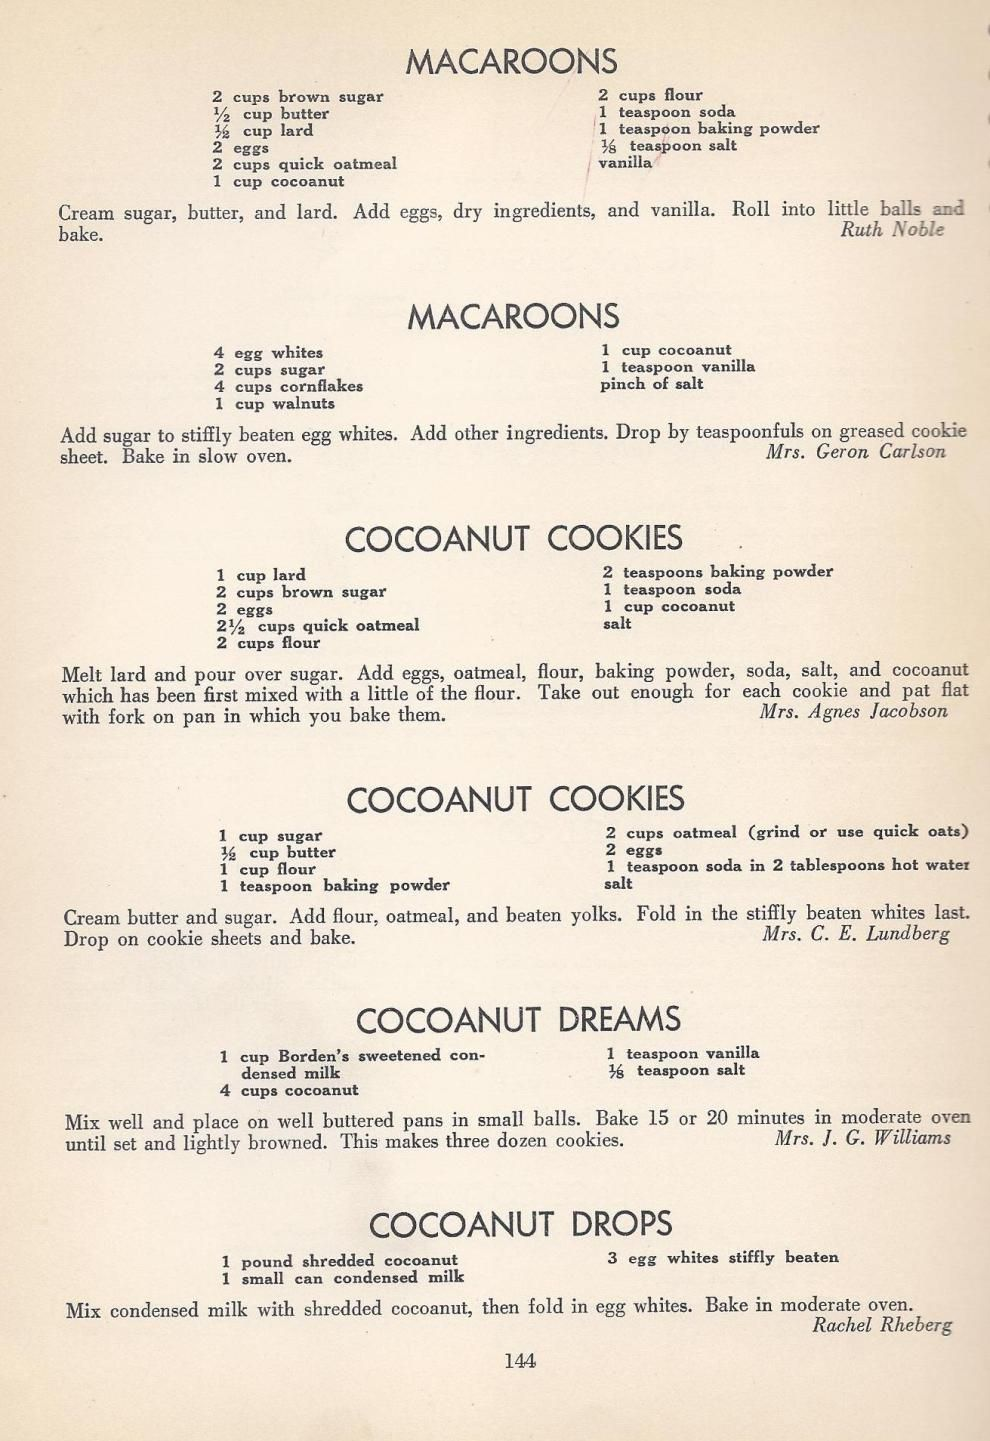 Vintage Cookies7 Vintage Recipes Cookie Recipes Old Recipes